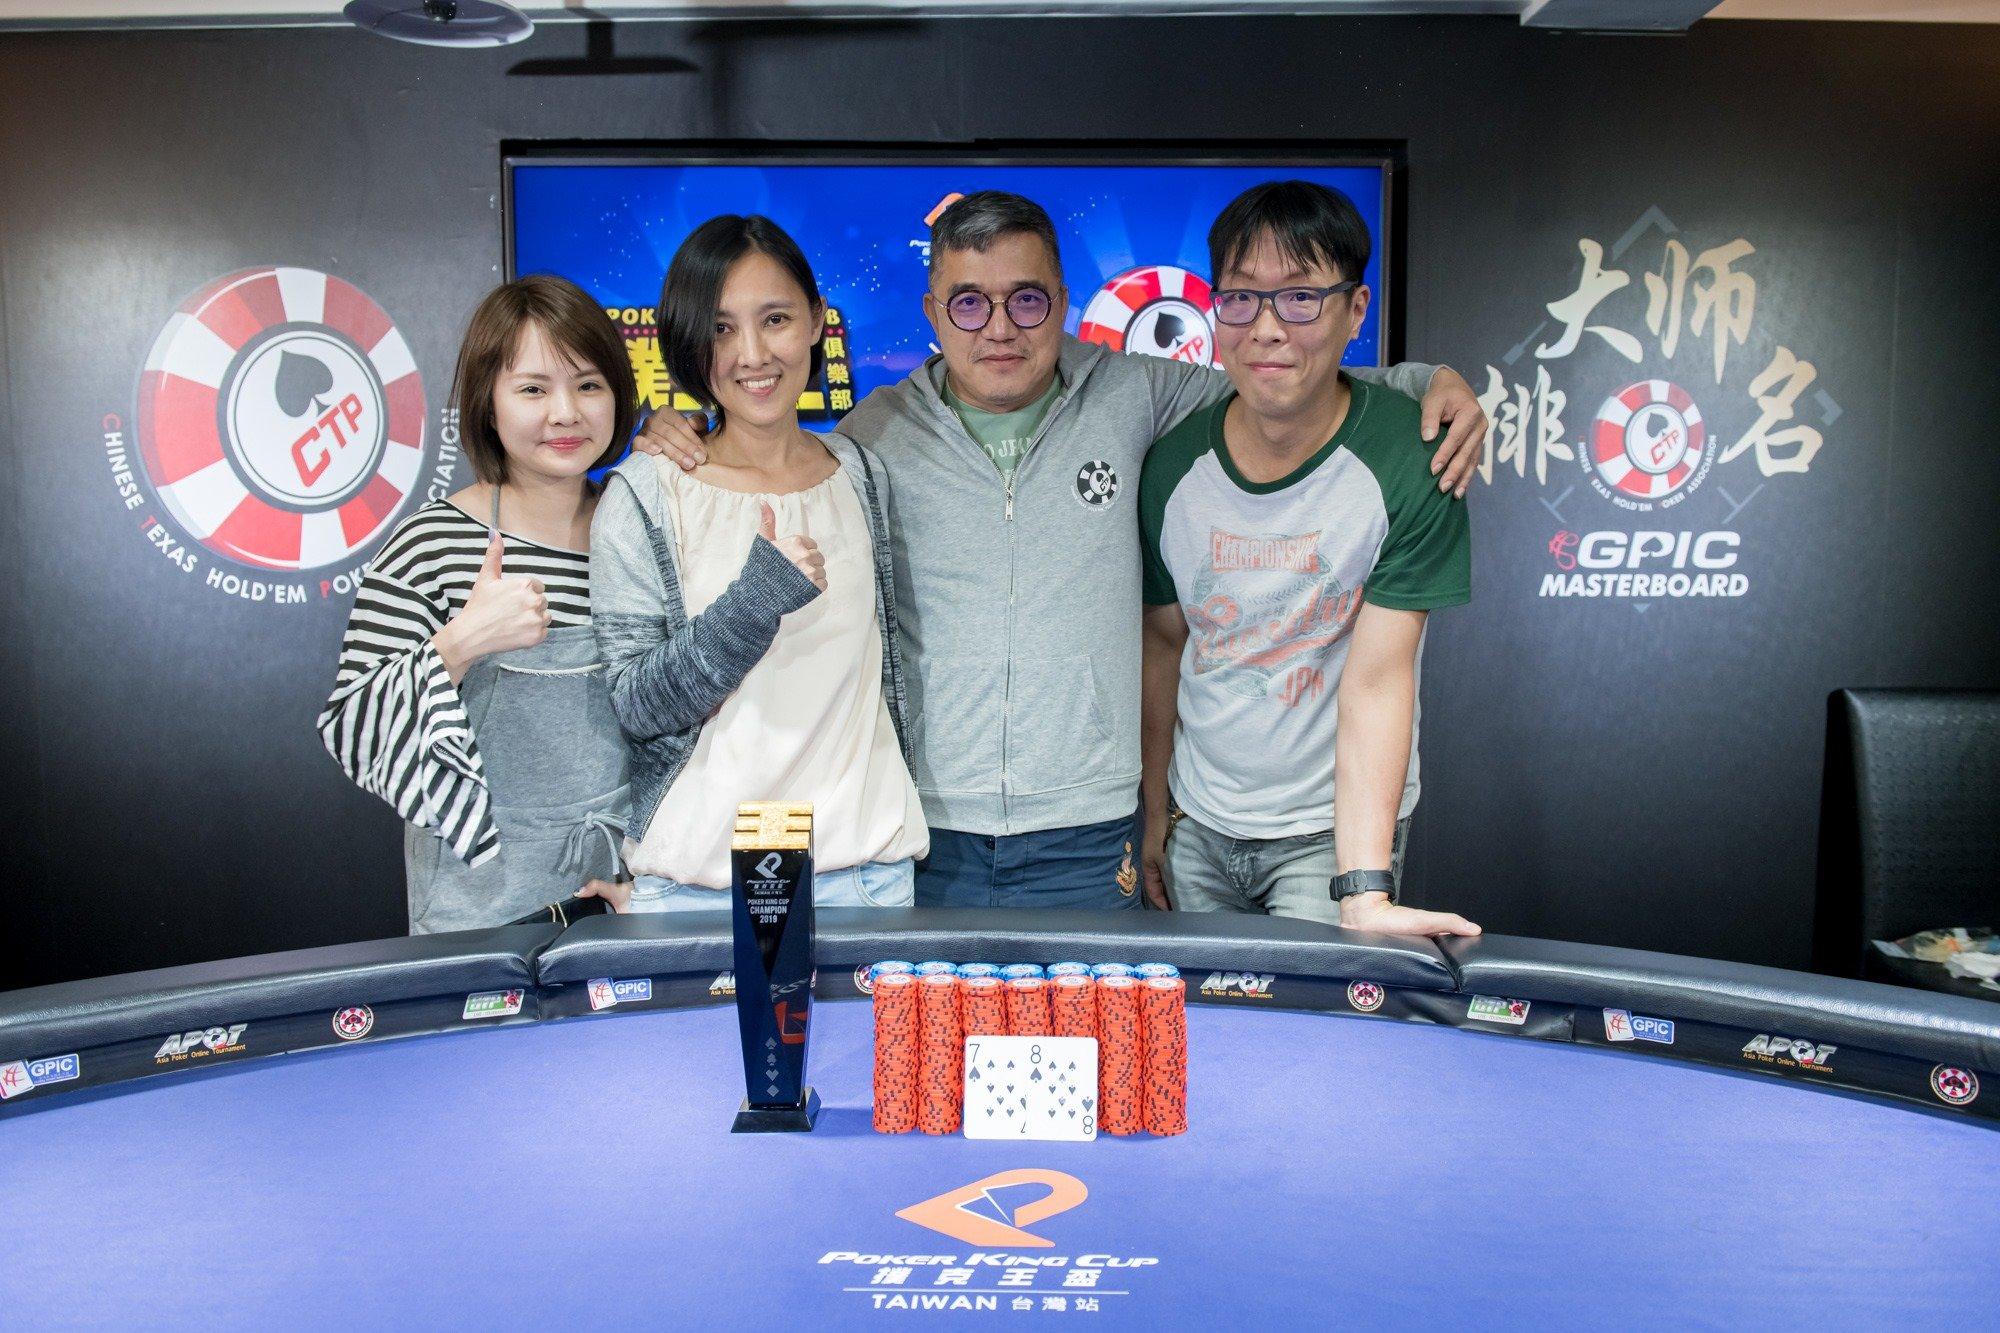 Chien Fa Chou wins the inaugural PKC Taiwan Main Event; David Erquiaga finishes runner-up